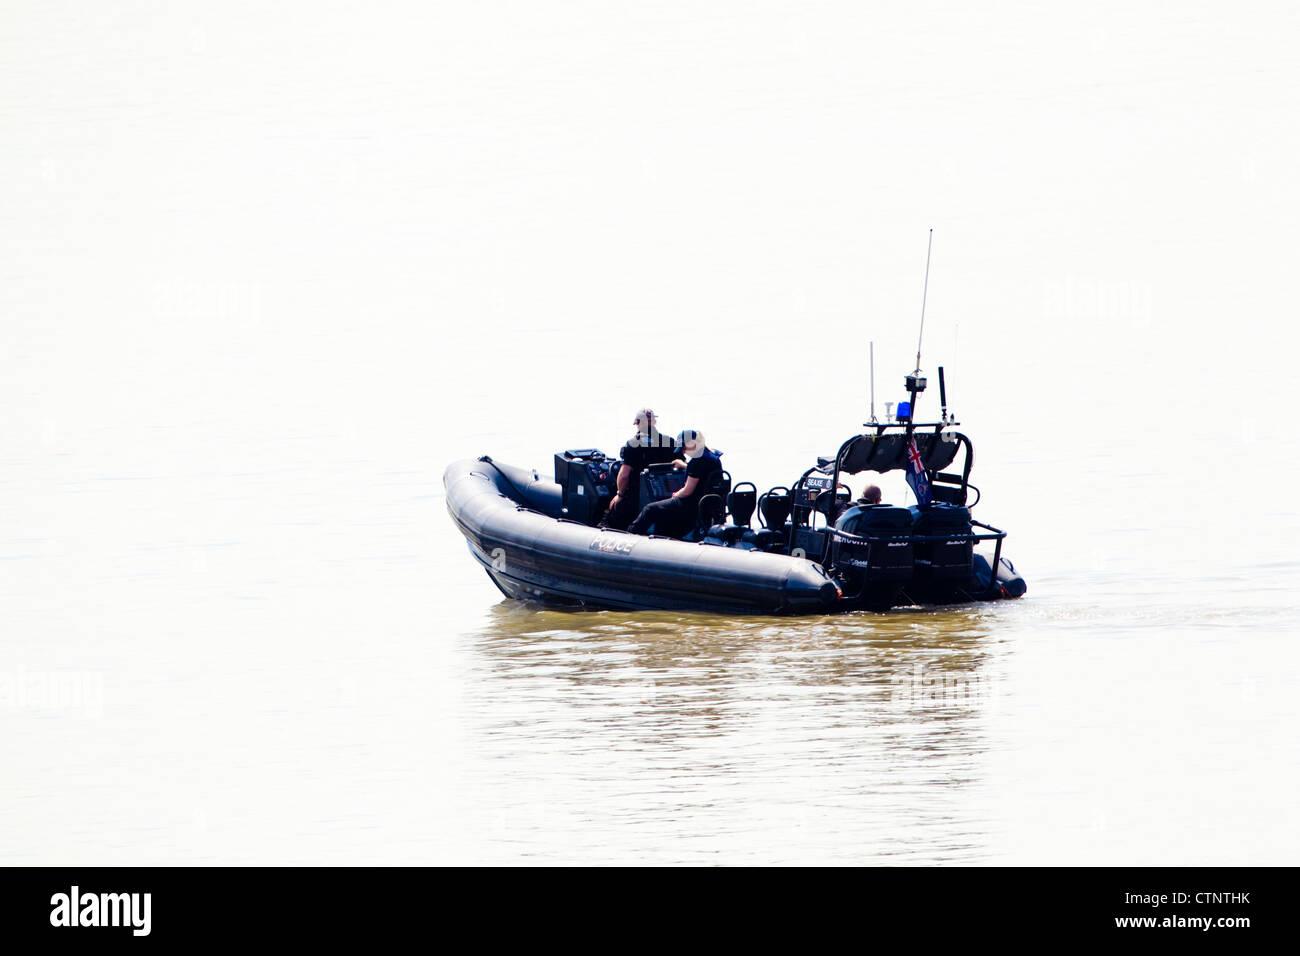 Police rib on River Thames, London, UK - Stock Image